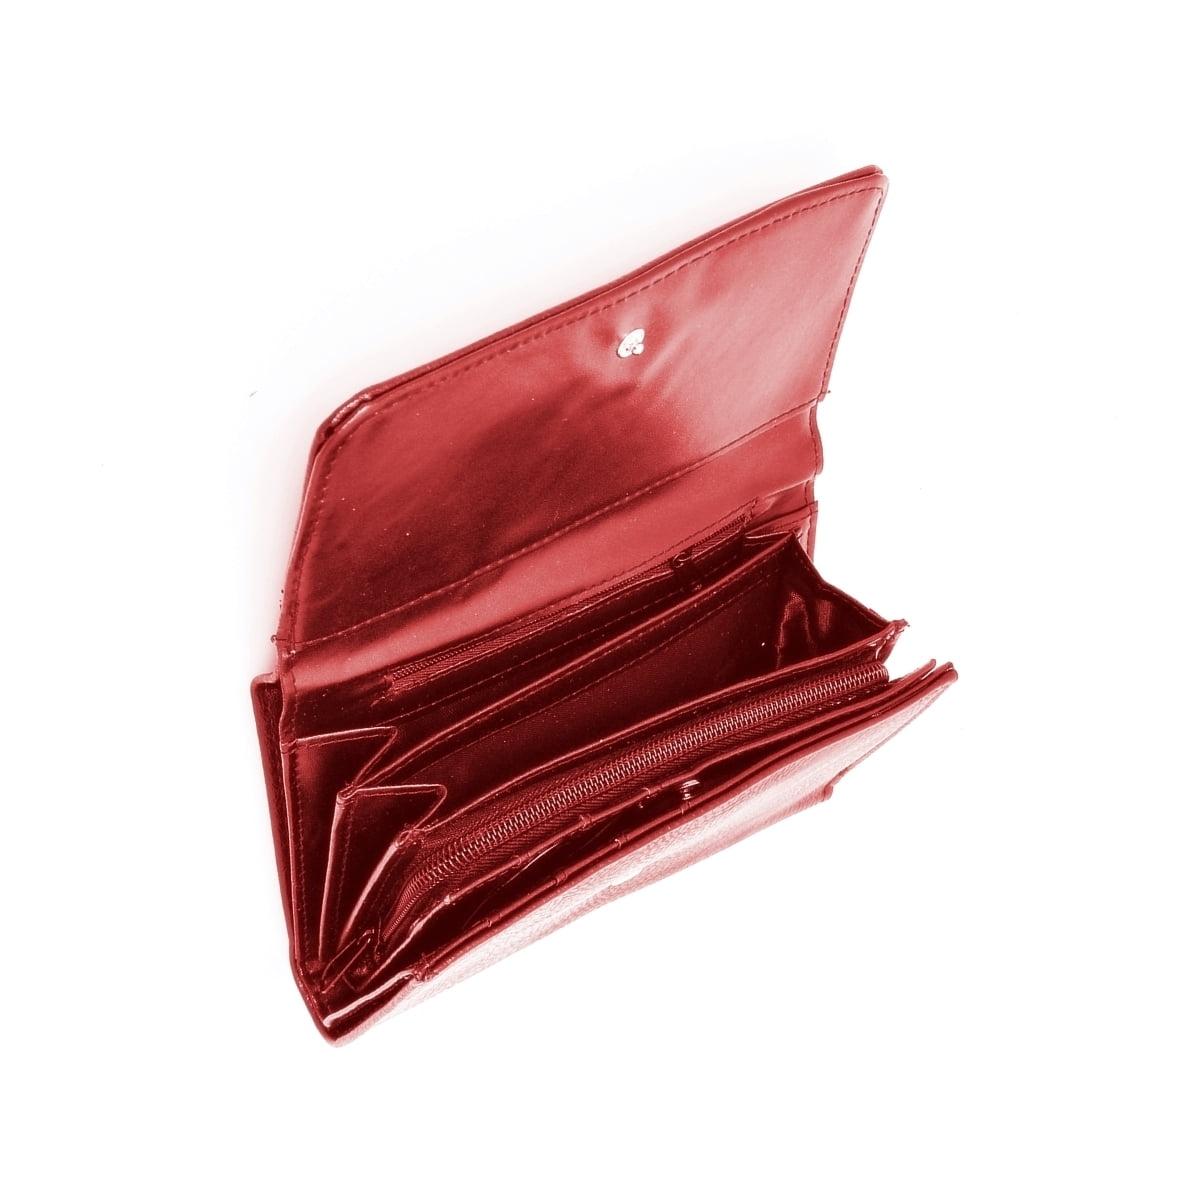 Portofel dama, rosu, cu buzunar mare lateral pentru bancnote, din piele ecologica, 18/10 cm, Magrot 021